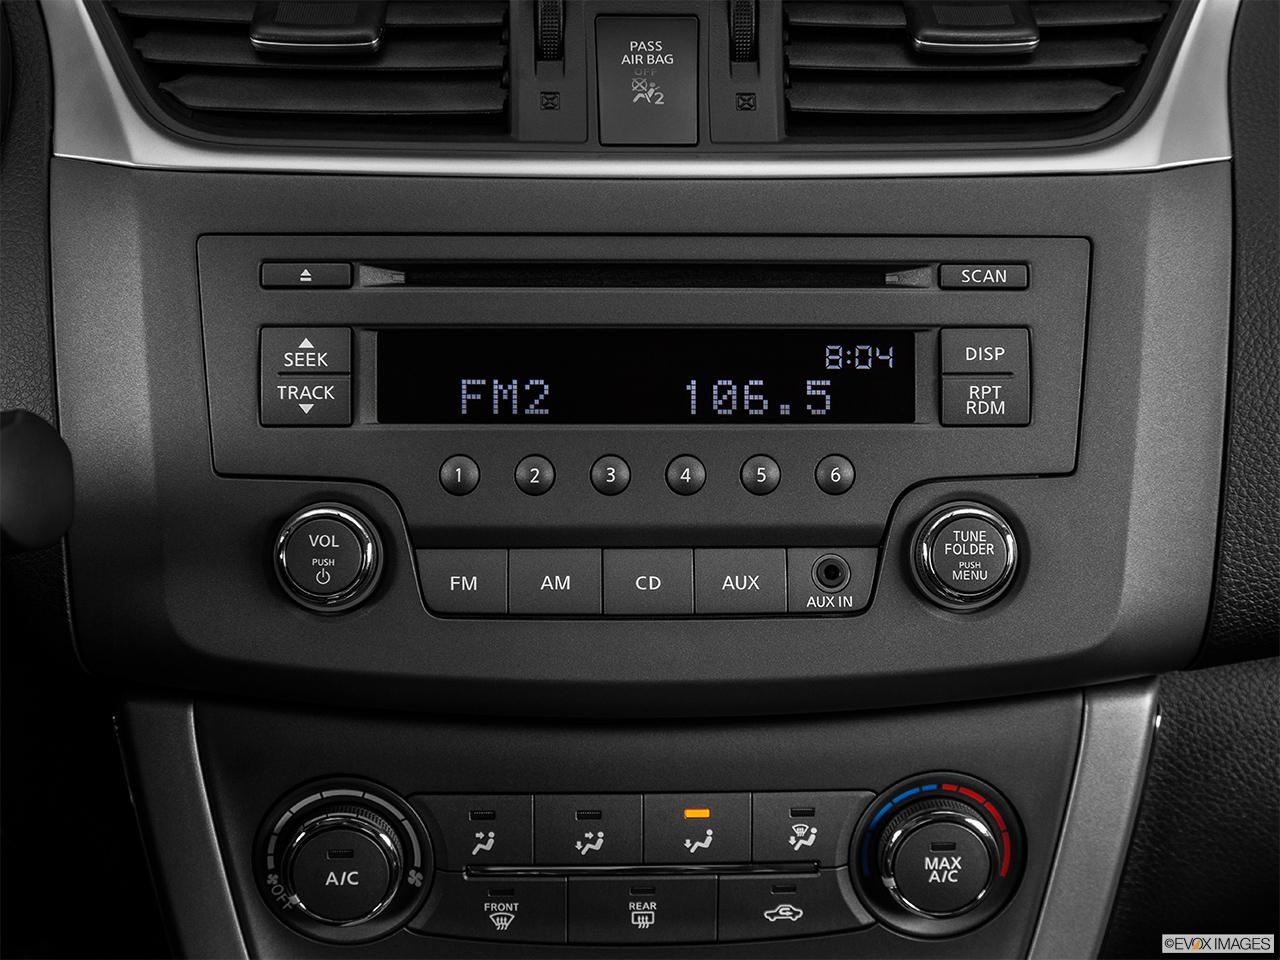 Nissan Sentra Sv >> 2015 Nissan Sentra I4 CVT SV Sedan - Closeup of radio head unit